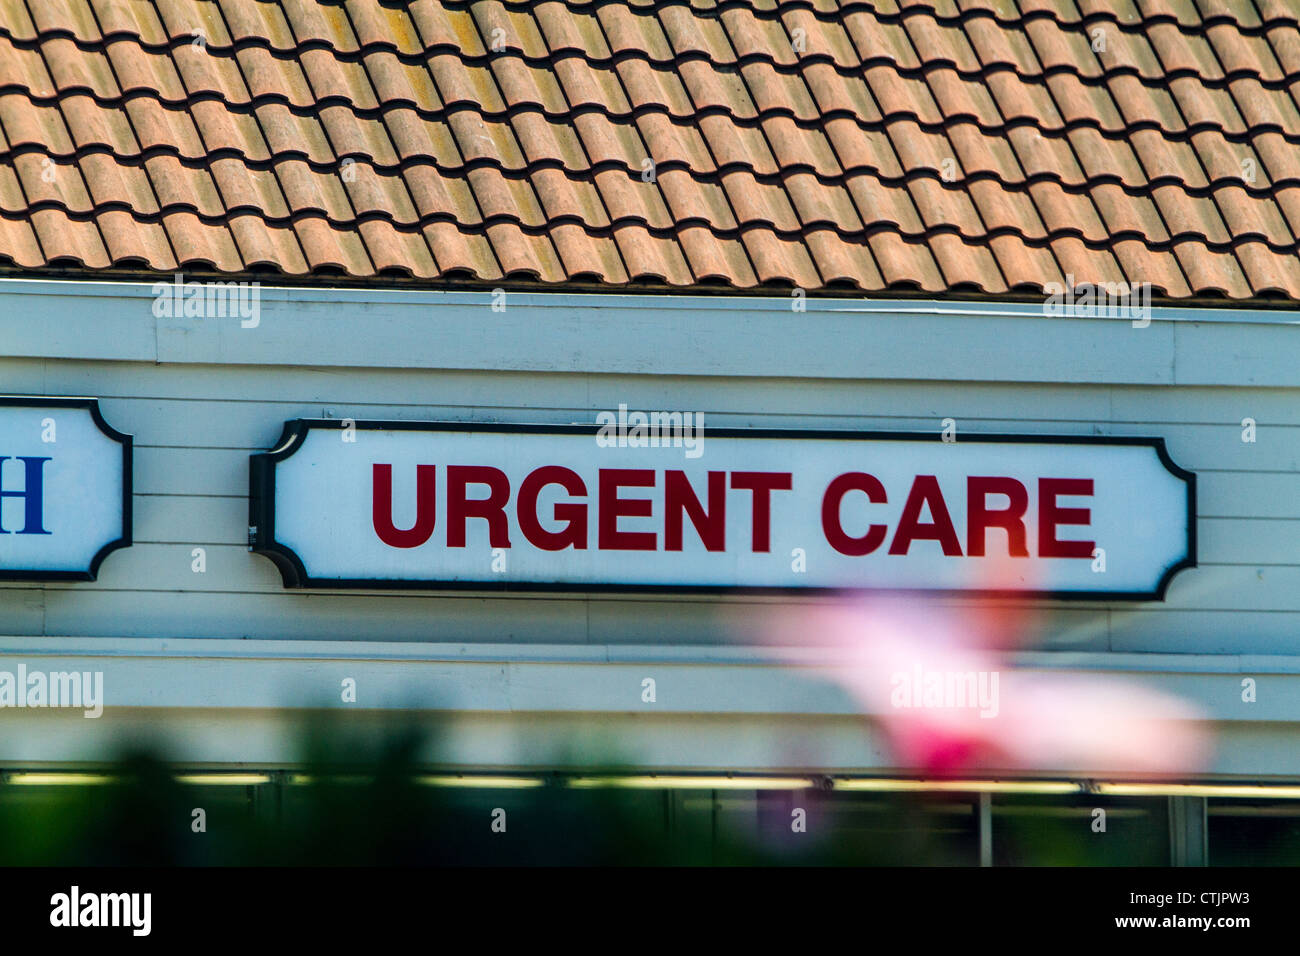 Hibiscus flower and urgent care sign in Santa Paula California - Stock Image